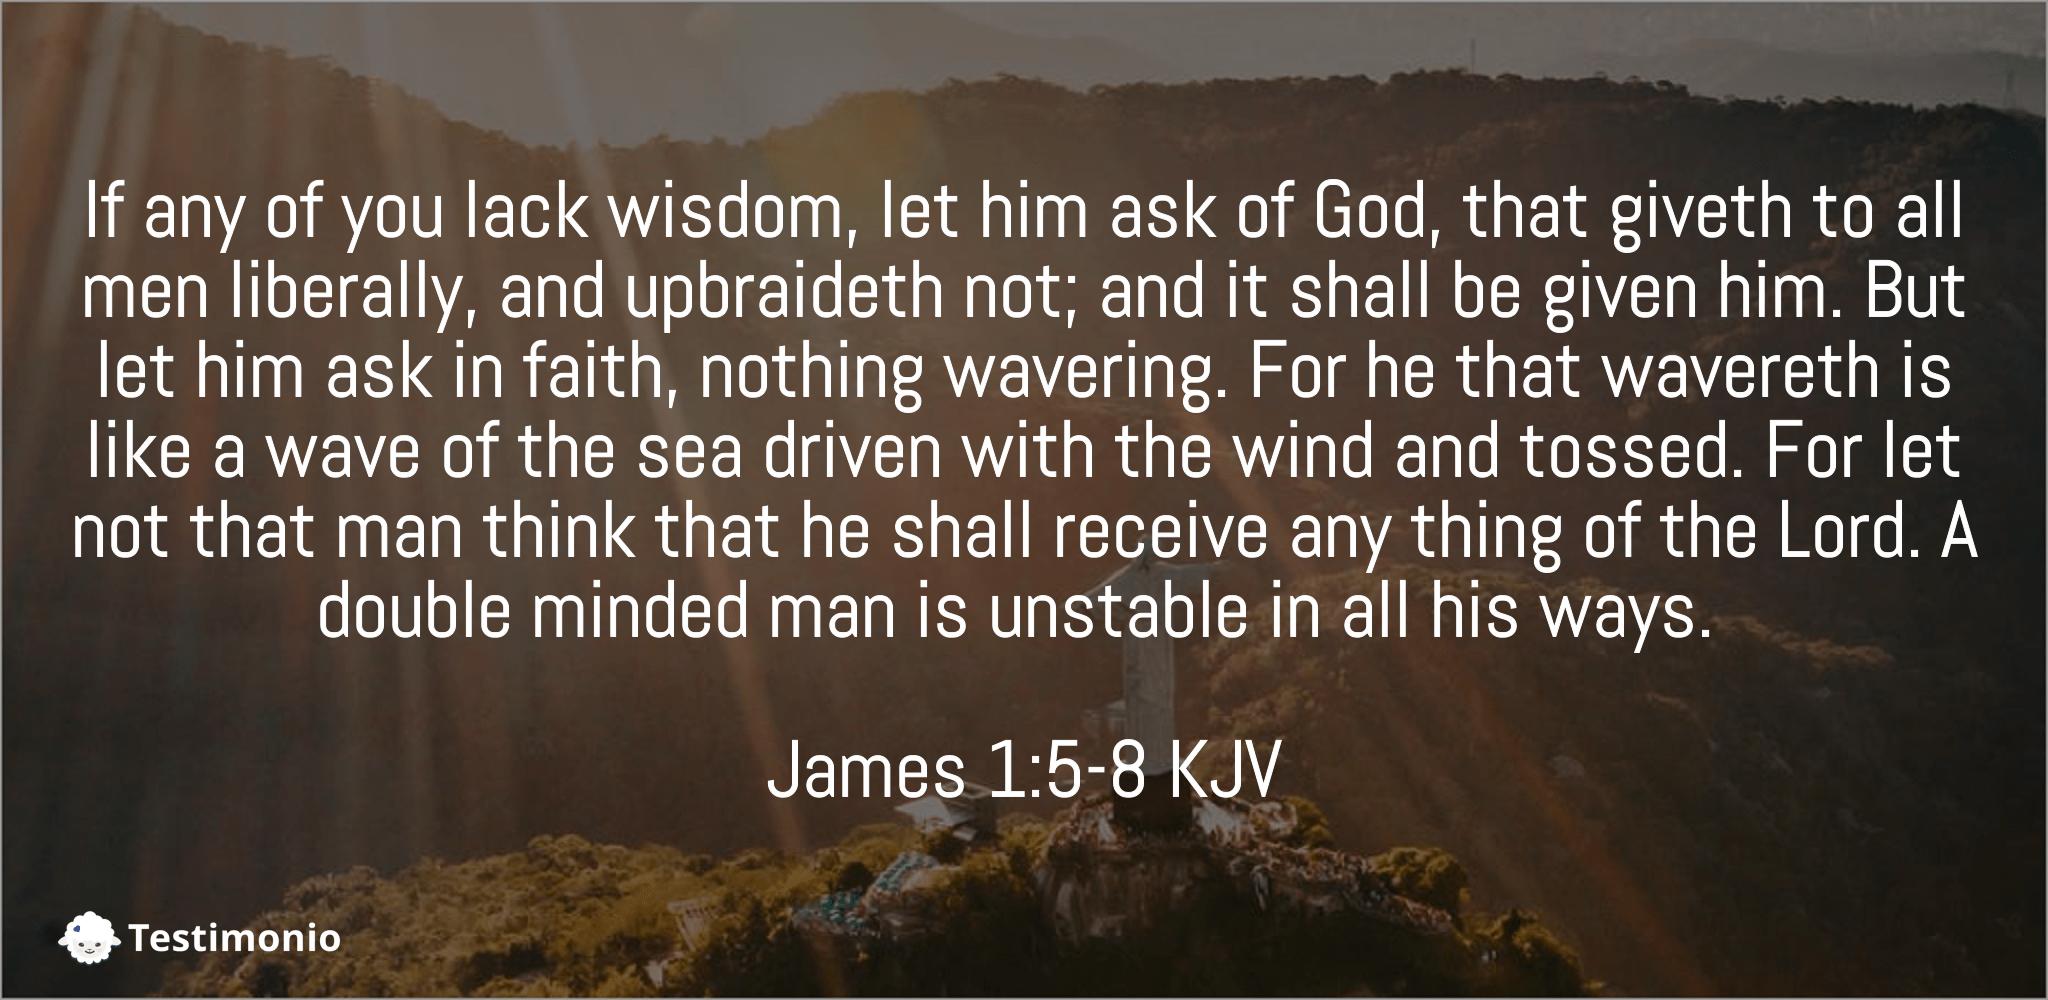 James 1:5-8